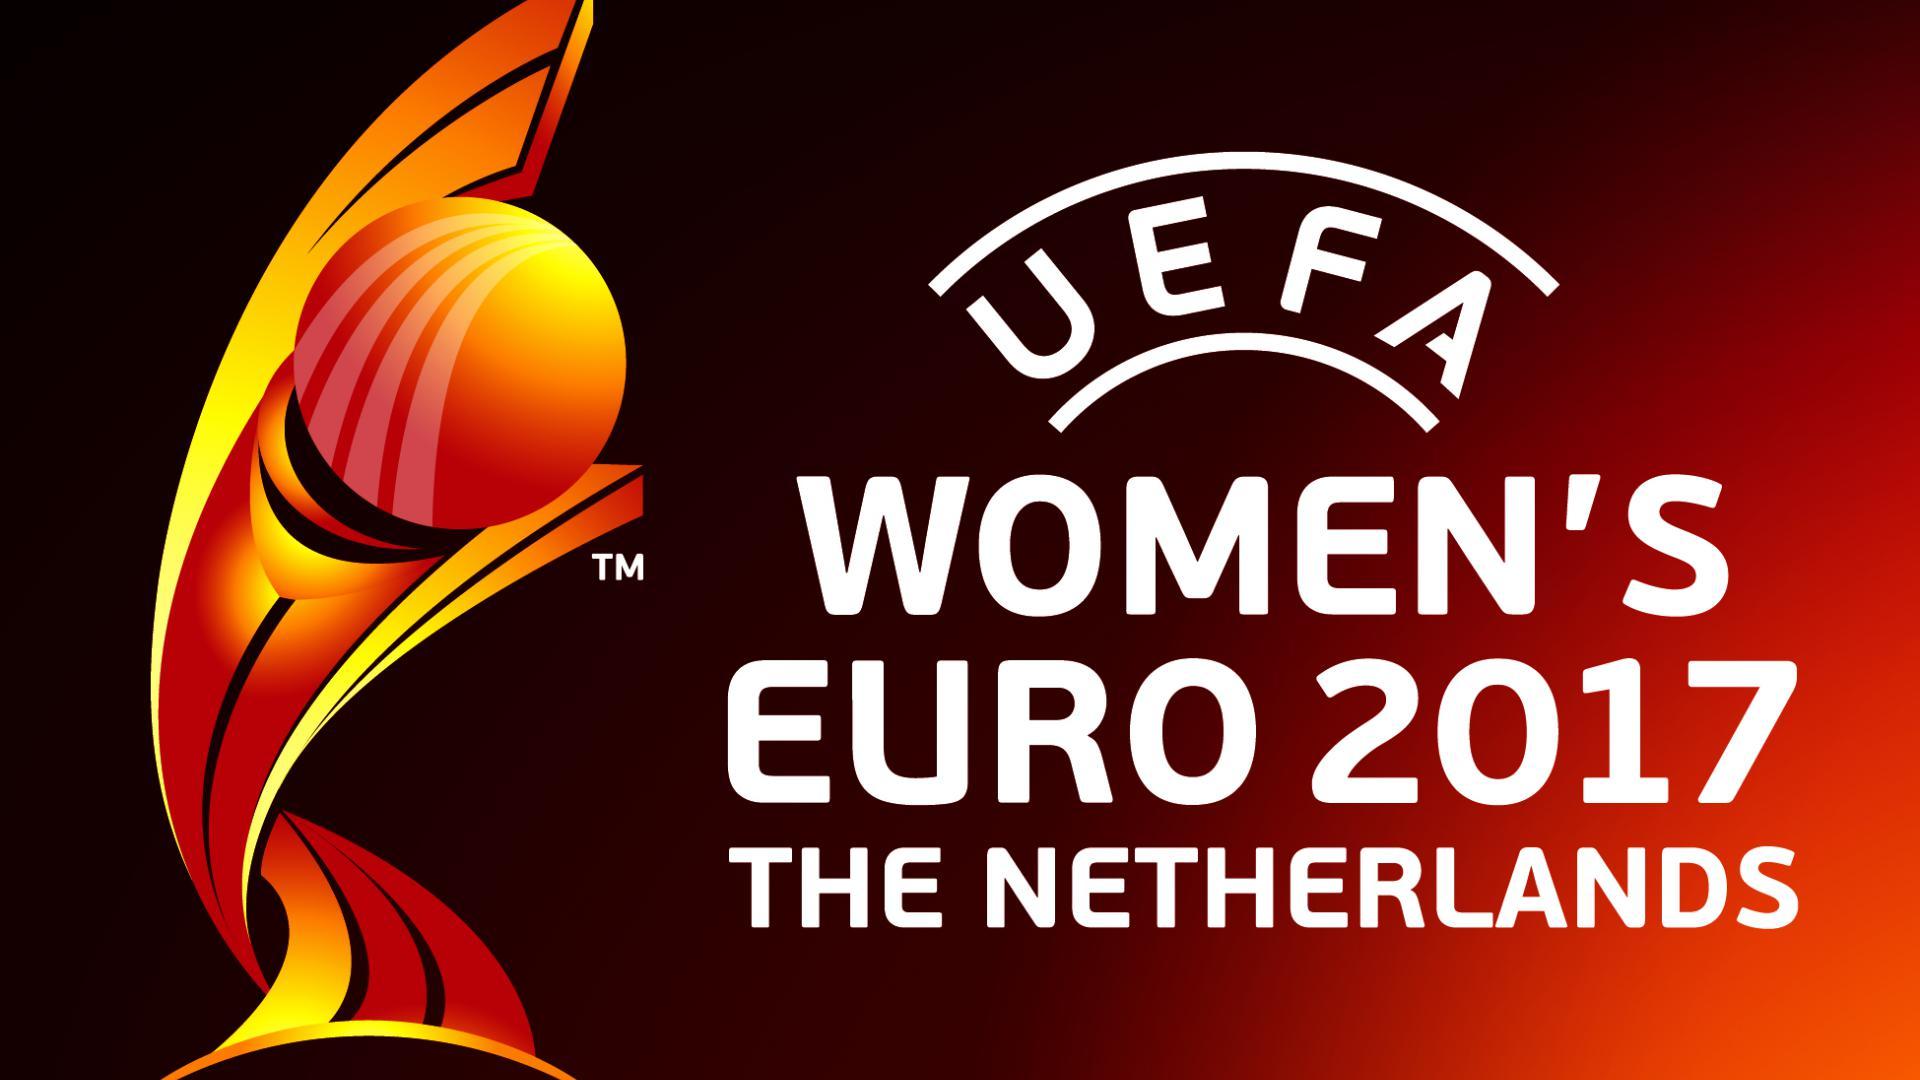 UEFA%20Women%27s%20EURO%202017_0.jpg?itok=4KYwCU8_